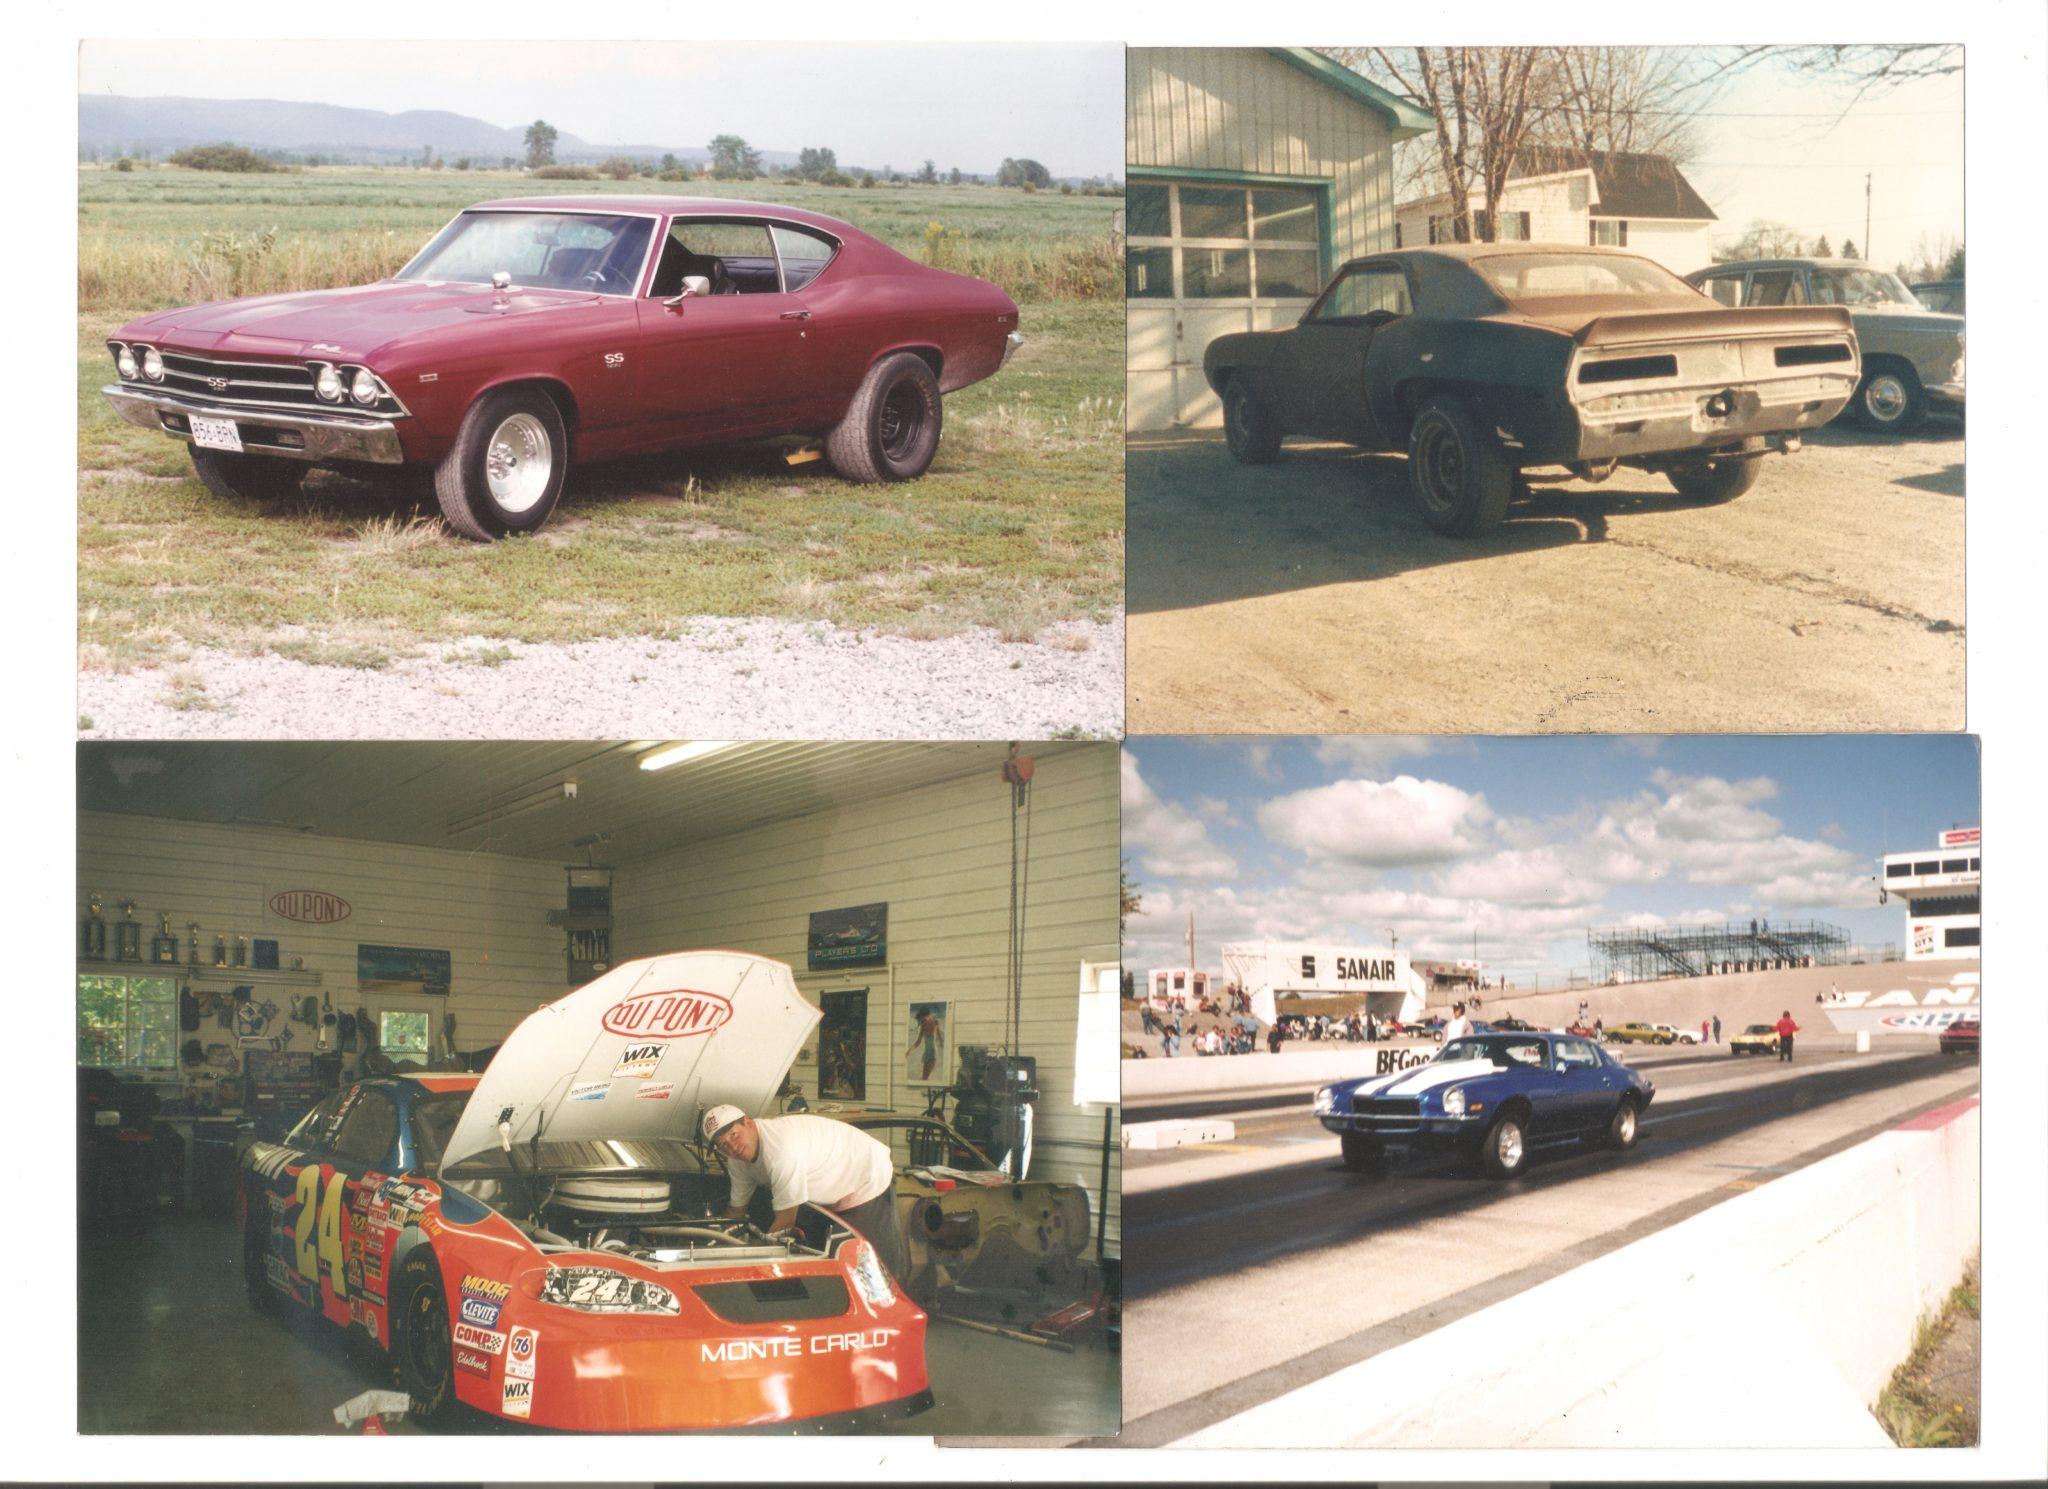 1969 Chevelle SS 1971 Camaro 1969 Camaro SS/RS Jeff Gordon Dupont